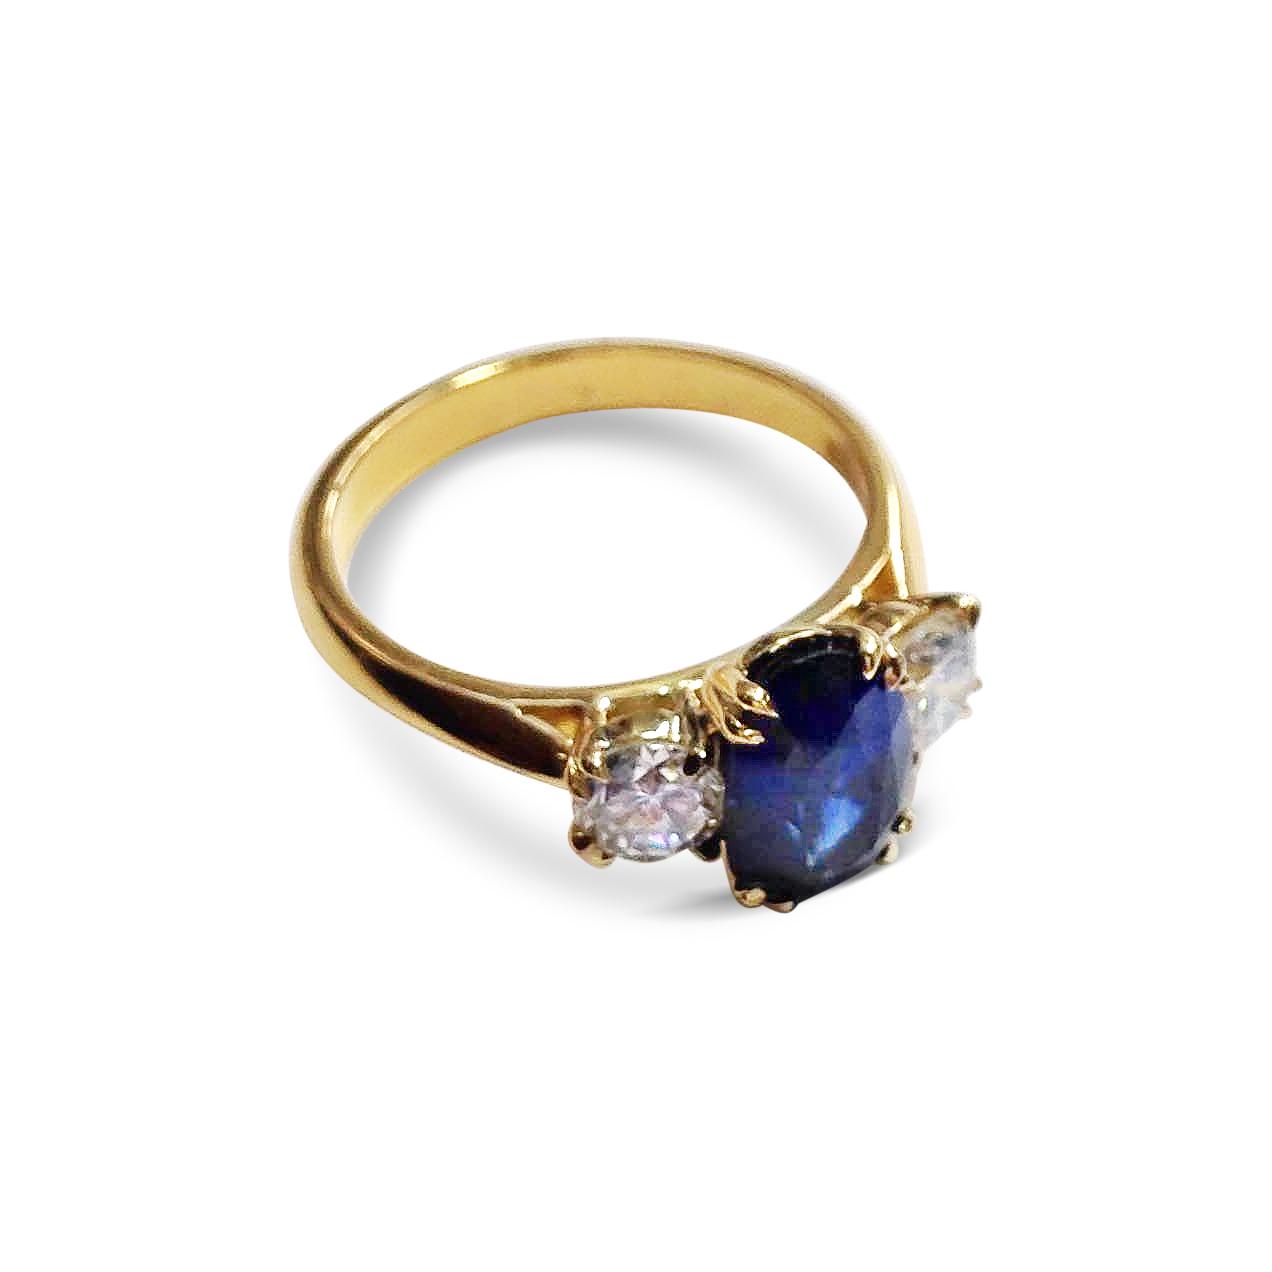 Sapphire-and-diamond-three-stone-ring-in-yellow-gold-1.jpg